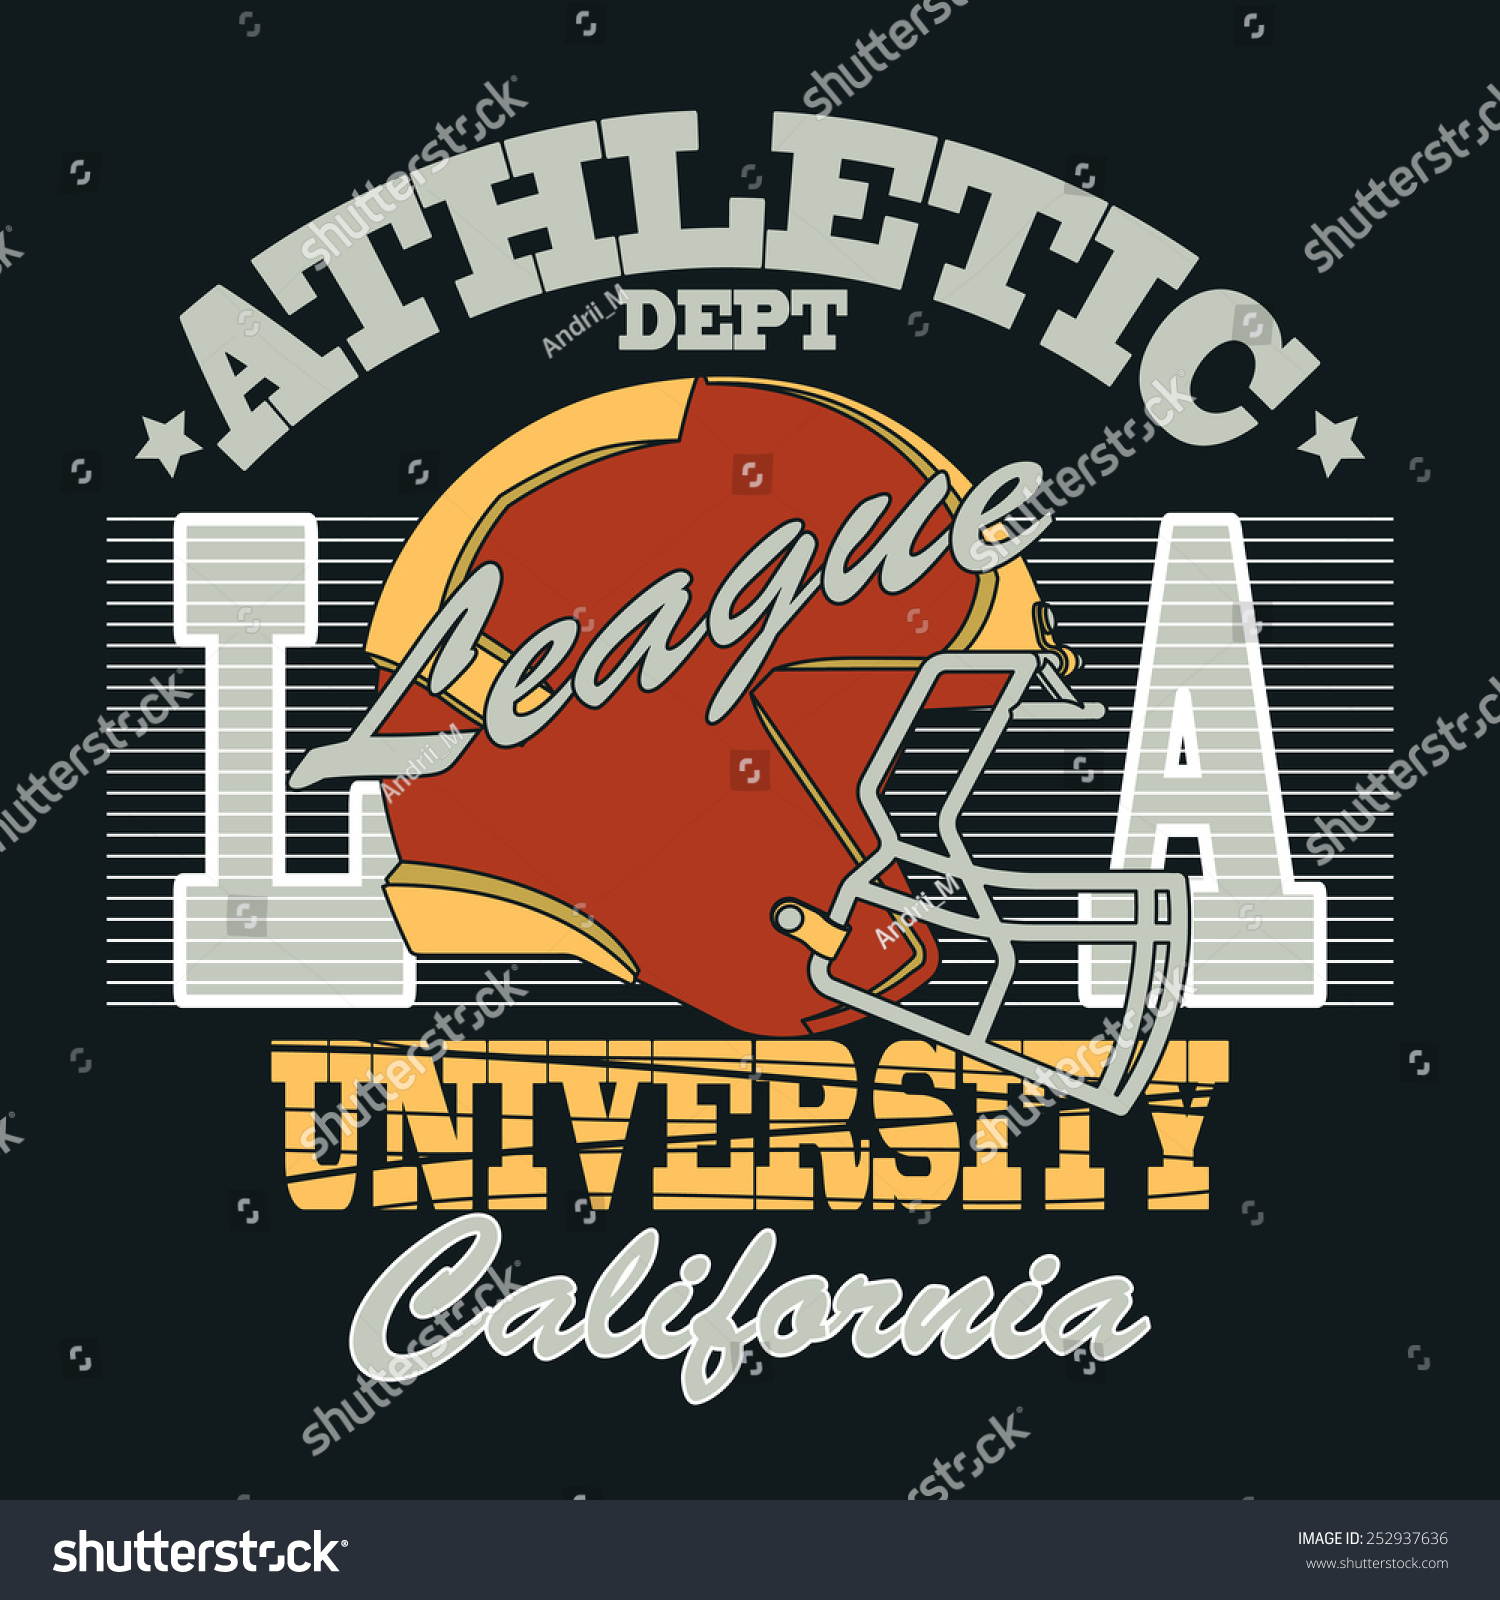 cb79f4cc6 California Sport Typography, University Football Athletic Dept. T-shirt  graphics, Vintage Print